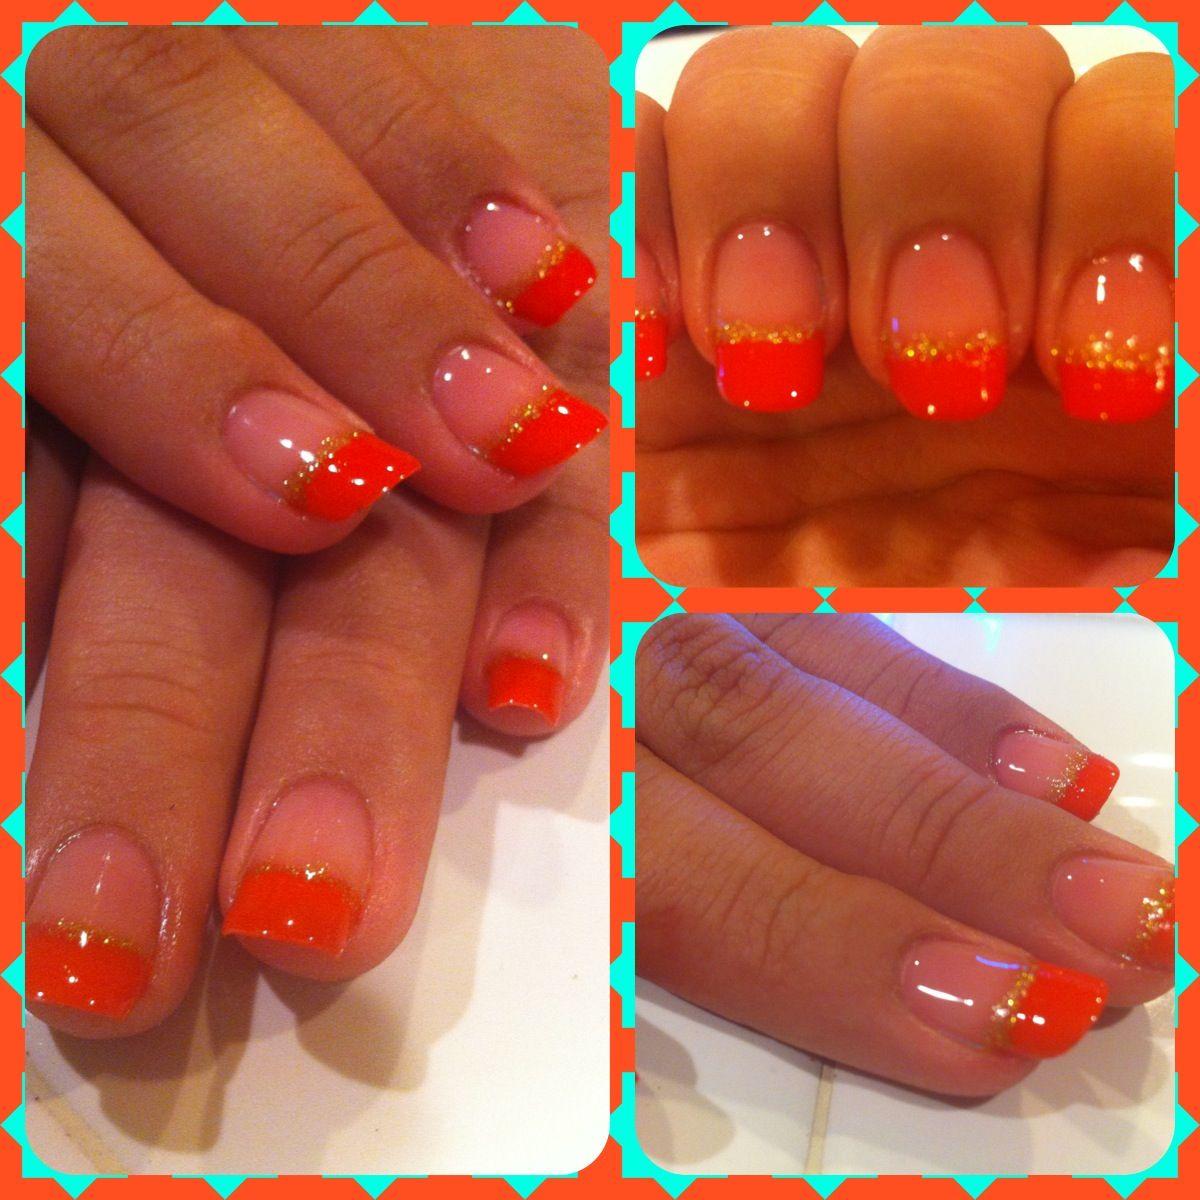 Red Carpet Manicure Led Gel Polish, wearing Nervous with ...